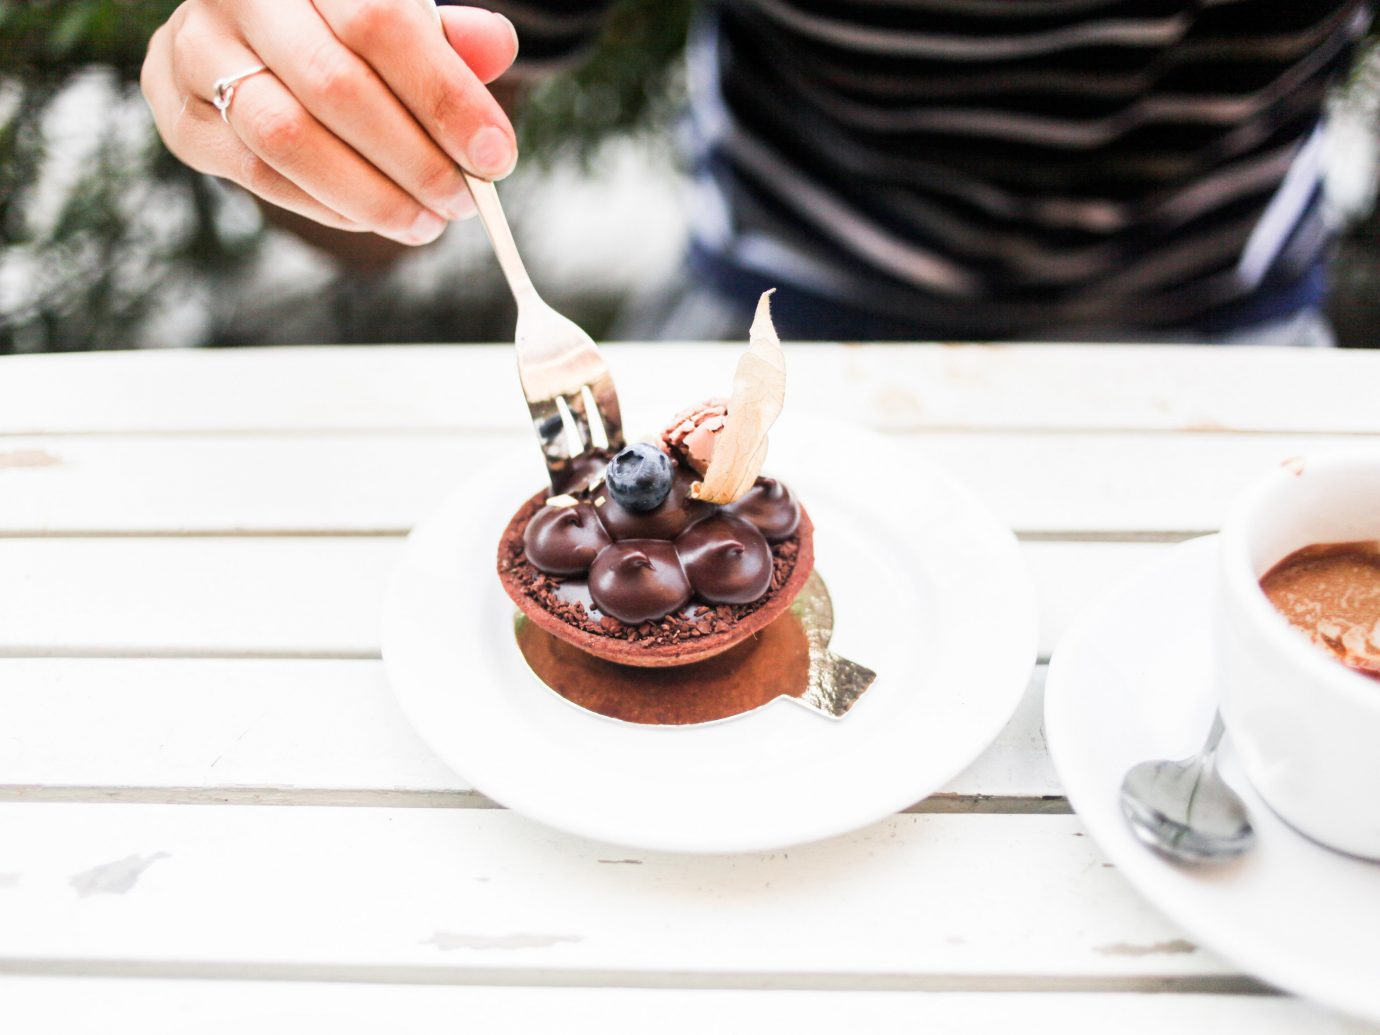 Offbeat person food dessert dish meal breakfast produce brunch sense chocolate